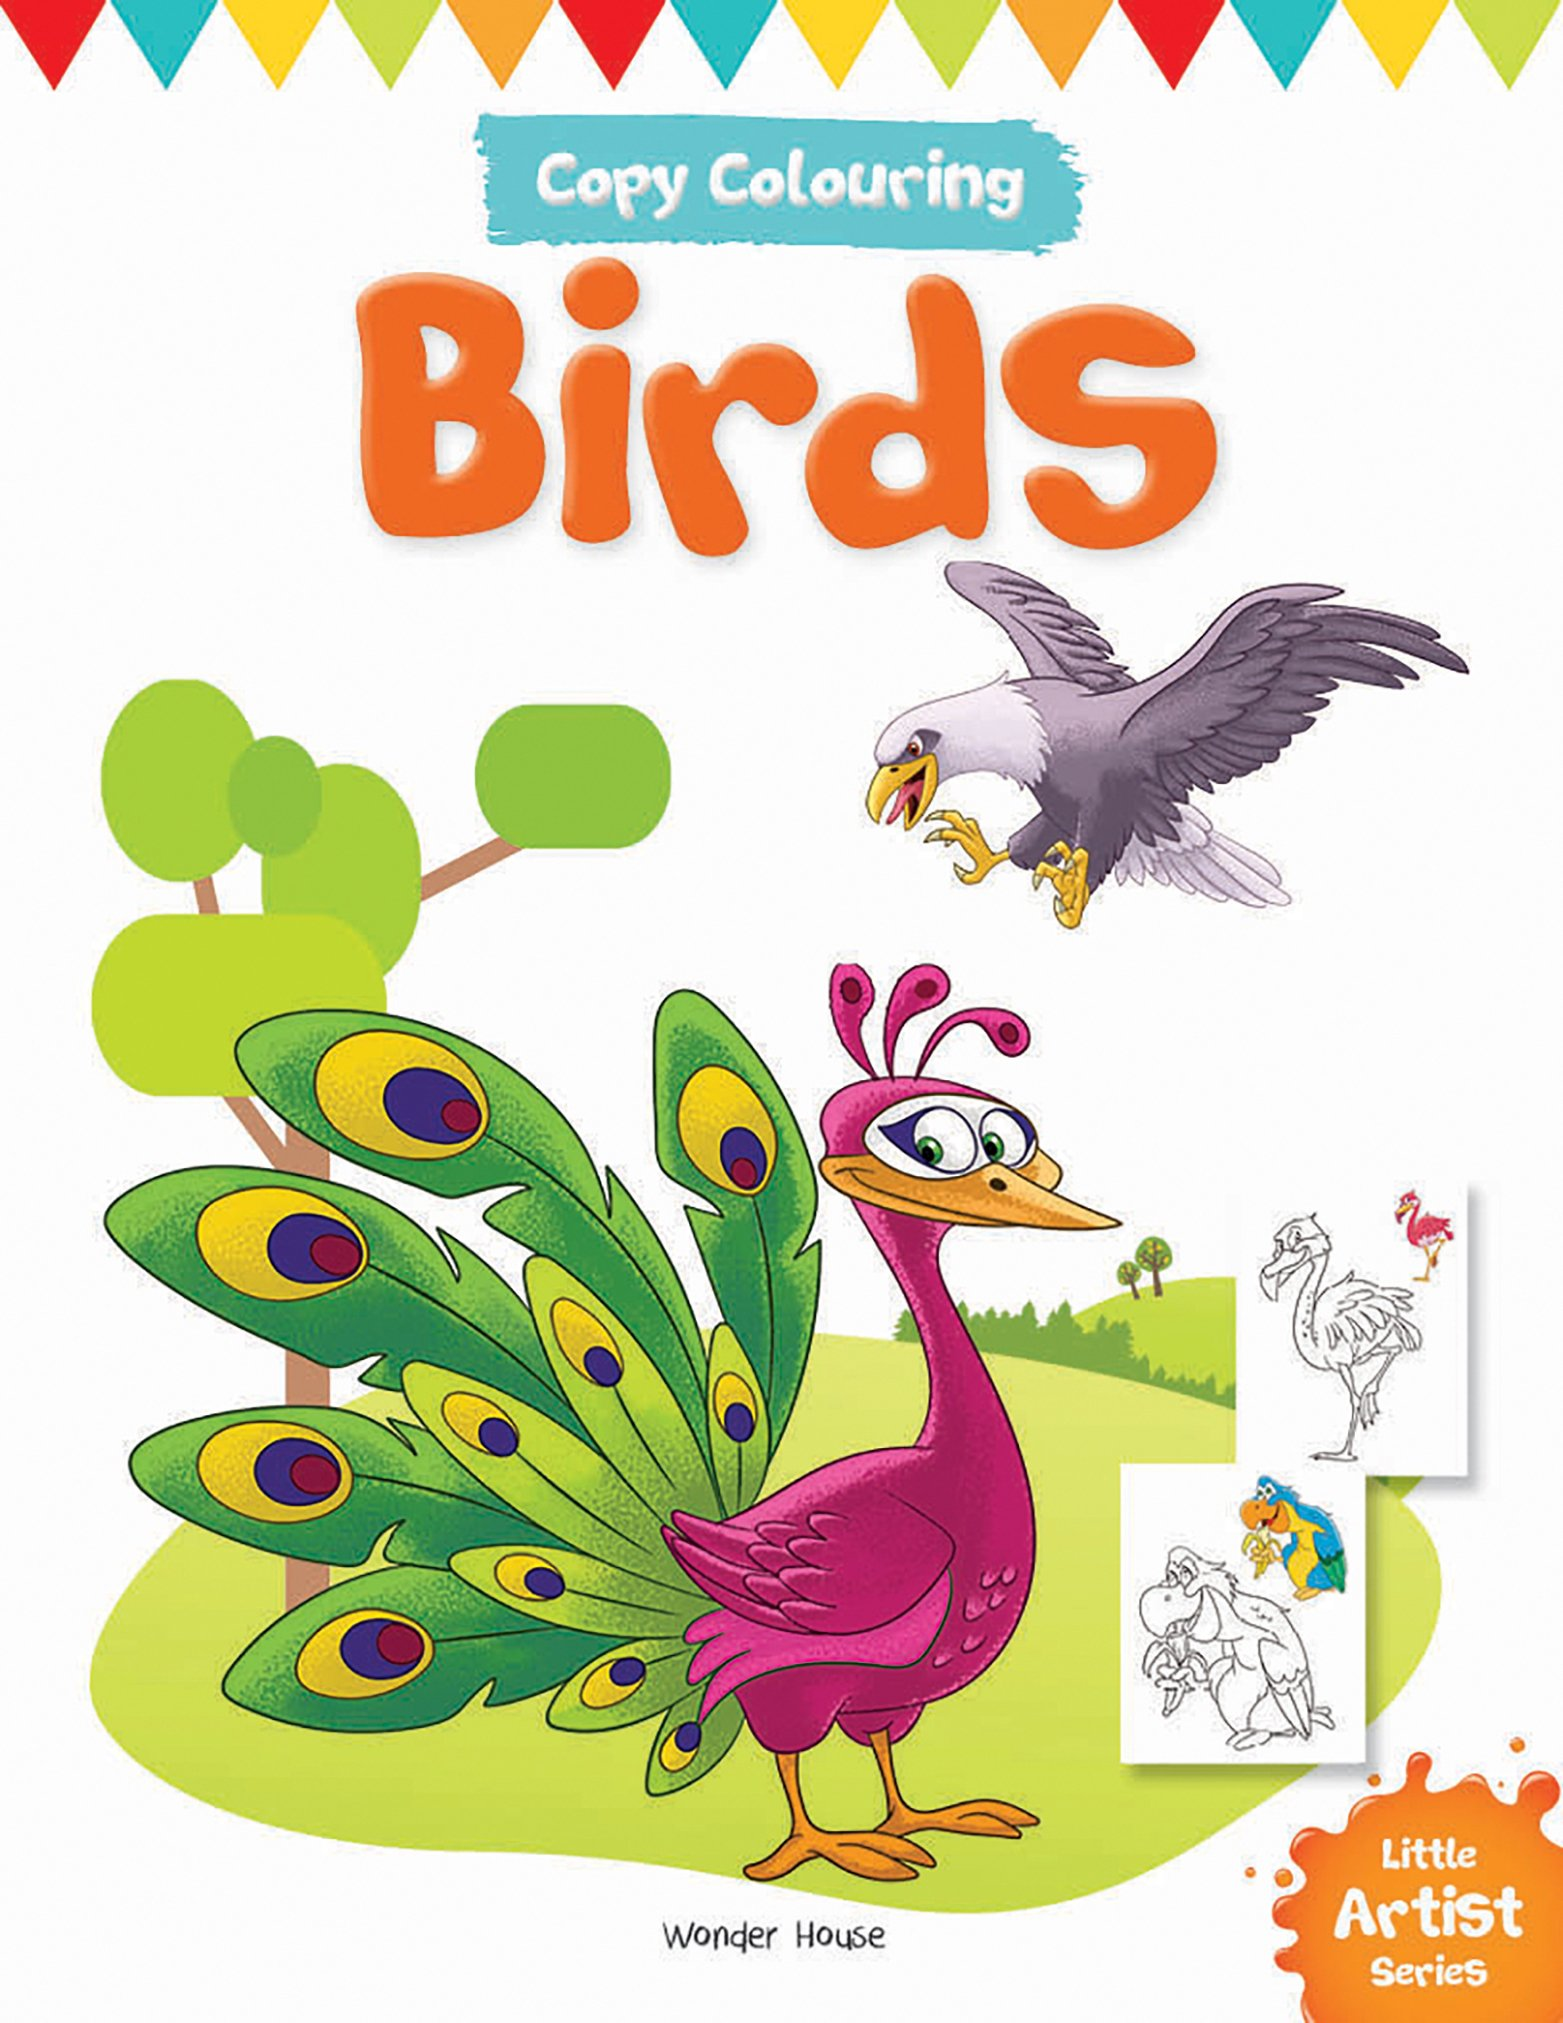 Little Artist Series - Birds : Copy Colouring Books